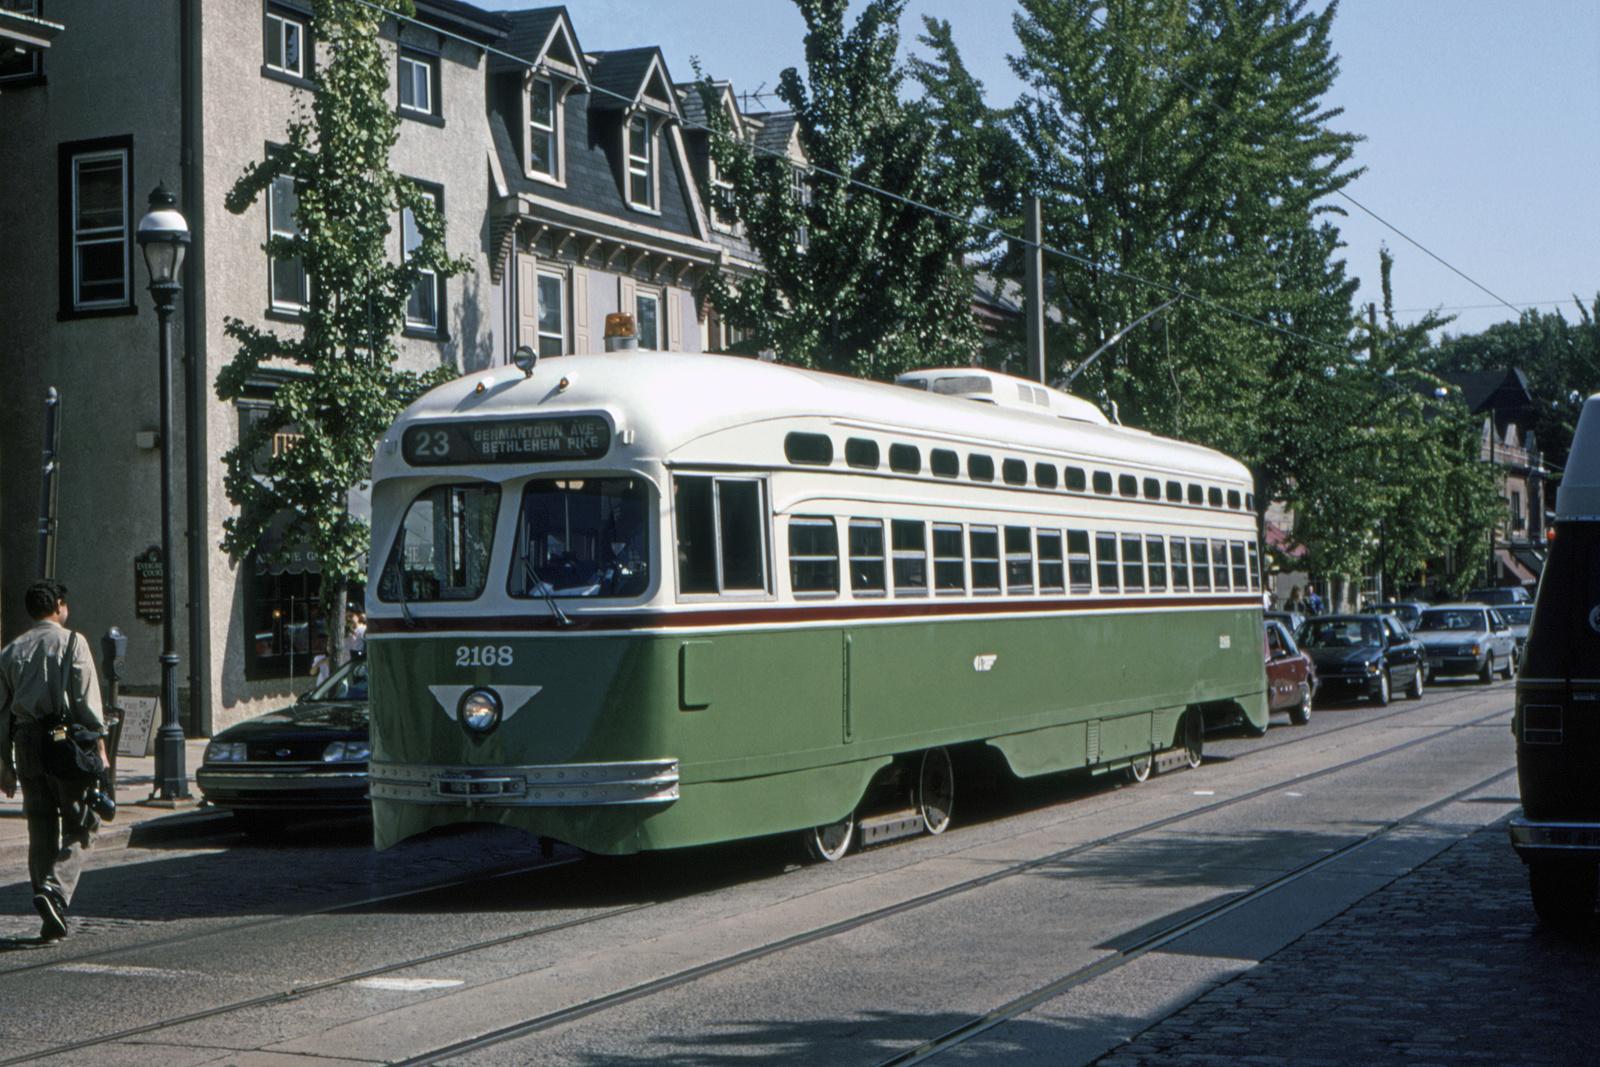 (855k, 1600x1067)<br><b>Country:</b> United States<br><b>City:</b> Philadelphia, PA<br><b>System:</b> SEPTA (or Predecessor)<br><b>Line:</b> Rt. 23-Germantown<br><b>Location:</b> Germantown/Evergreen<br><b>Car:</b> PTC/SEPTA Postwar All-electric PCC (St.Louis, 1948) 2168 <br><b>Collection of:</b> David Pirmann<br><b>Date:</b> 10/1993<br><b>Viewed (this week/total):</b> 0 / 39